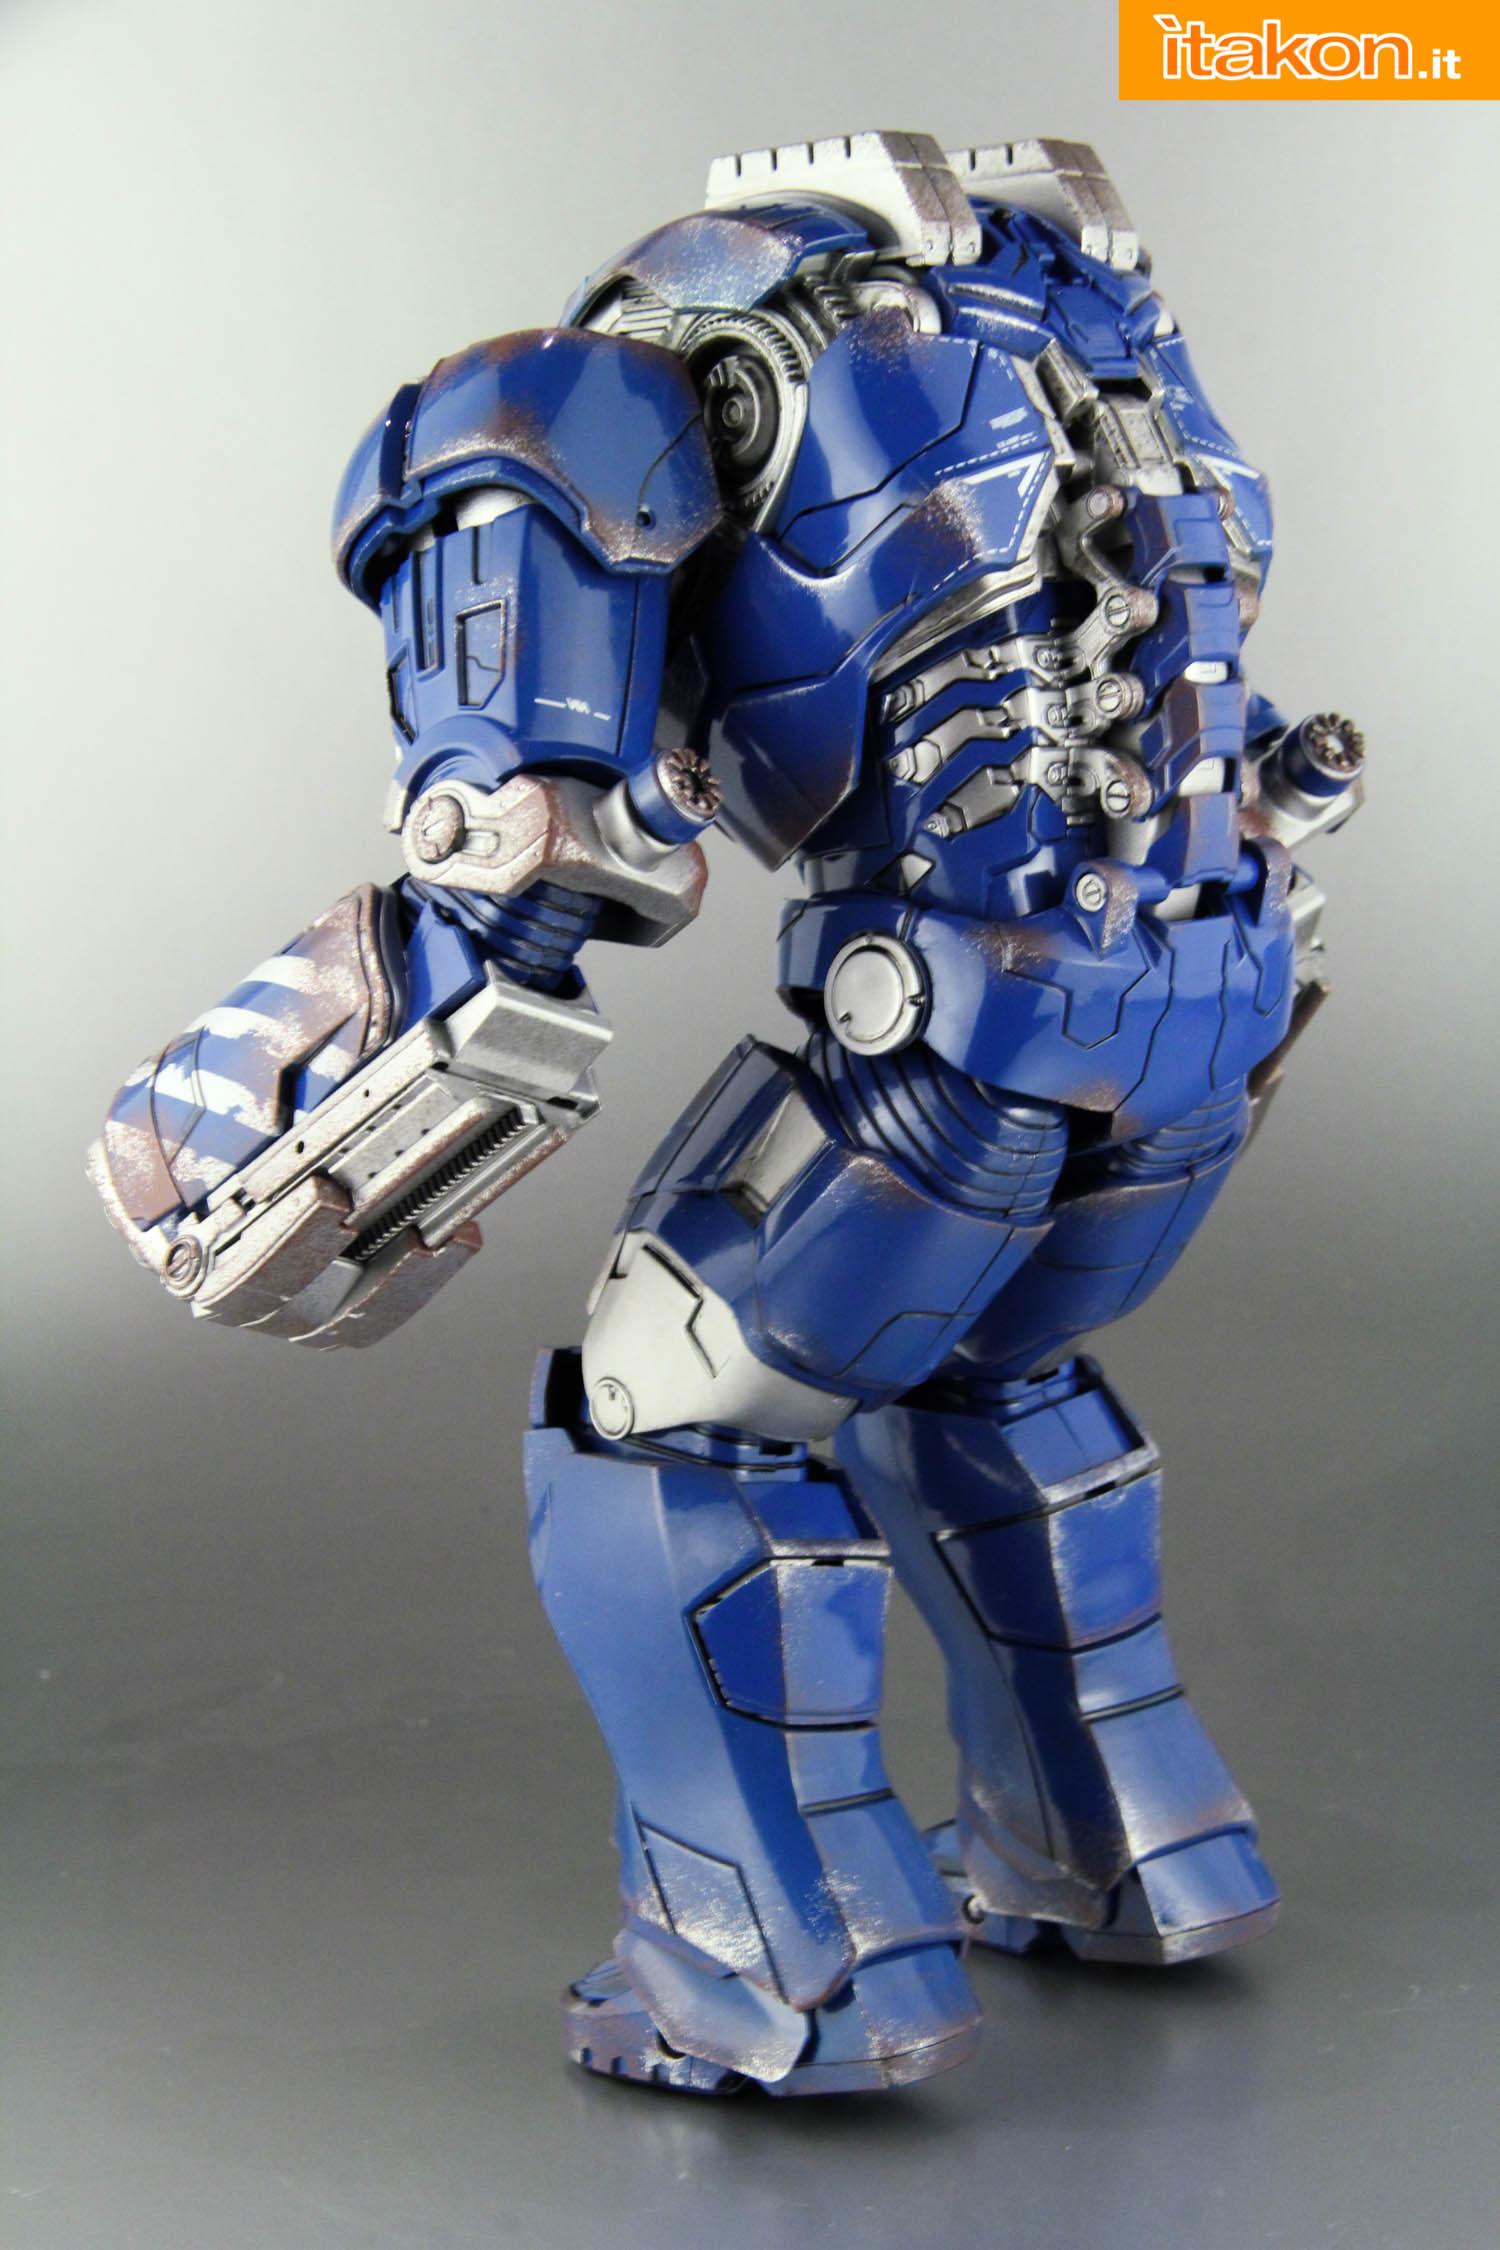 Link a comicave-igor-iron-man-figure-12